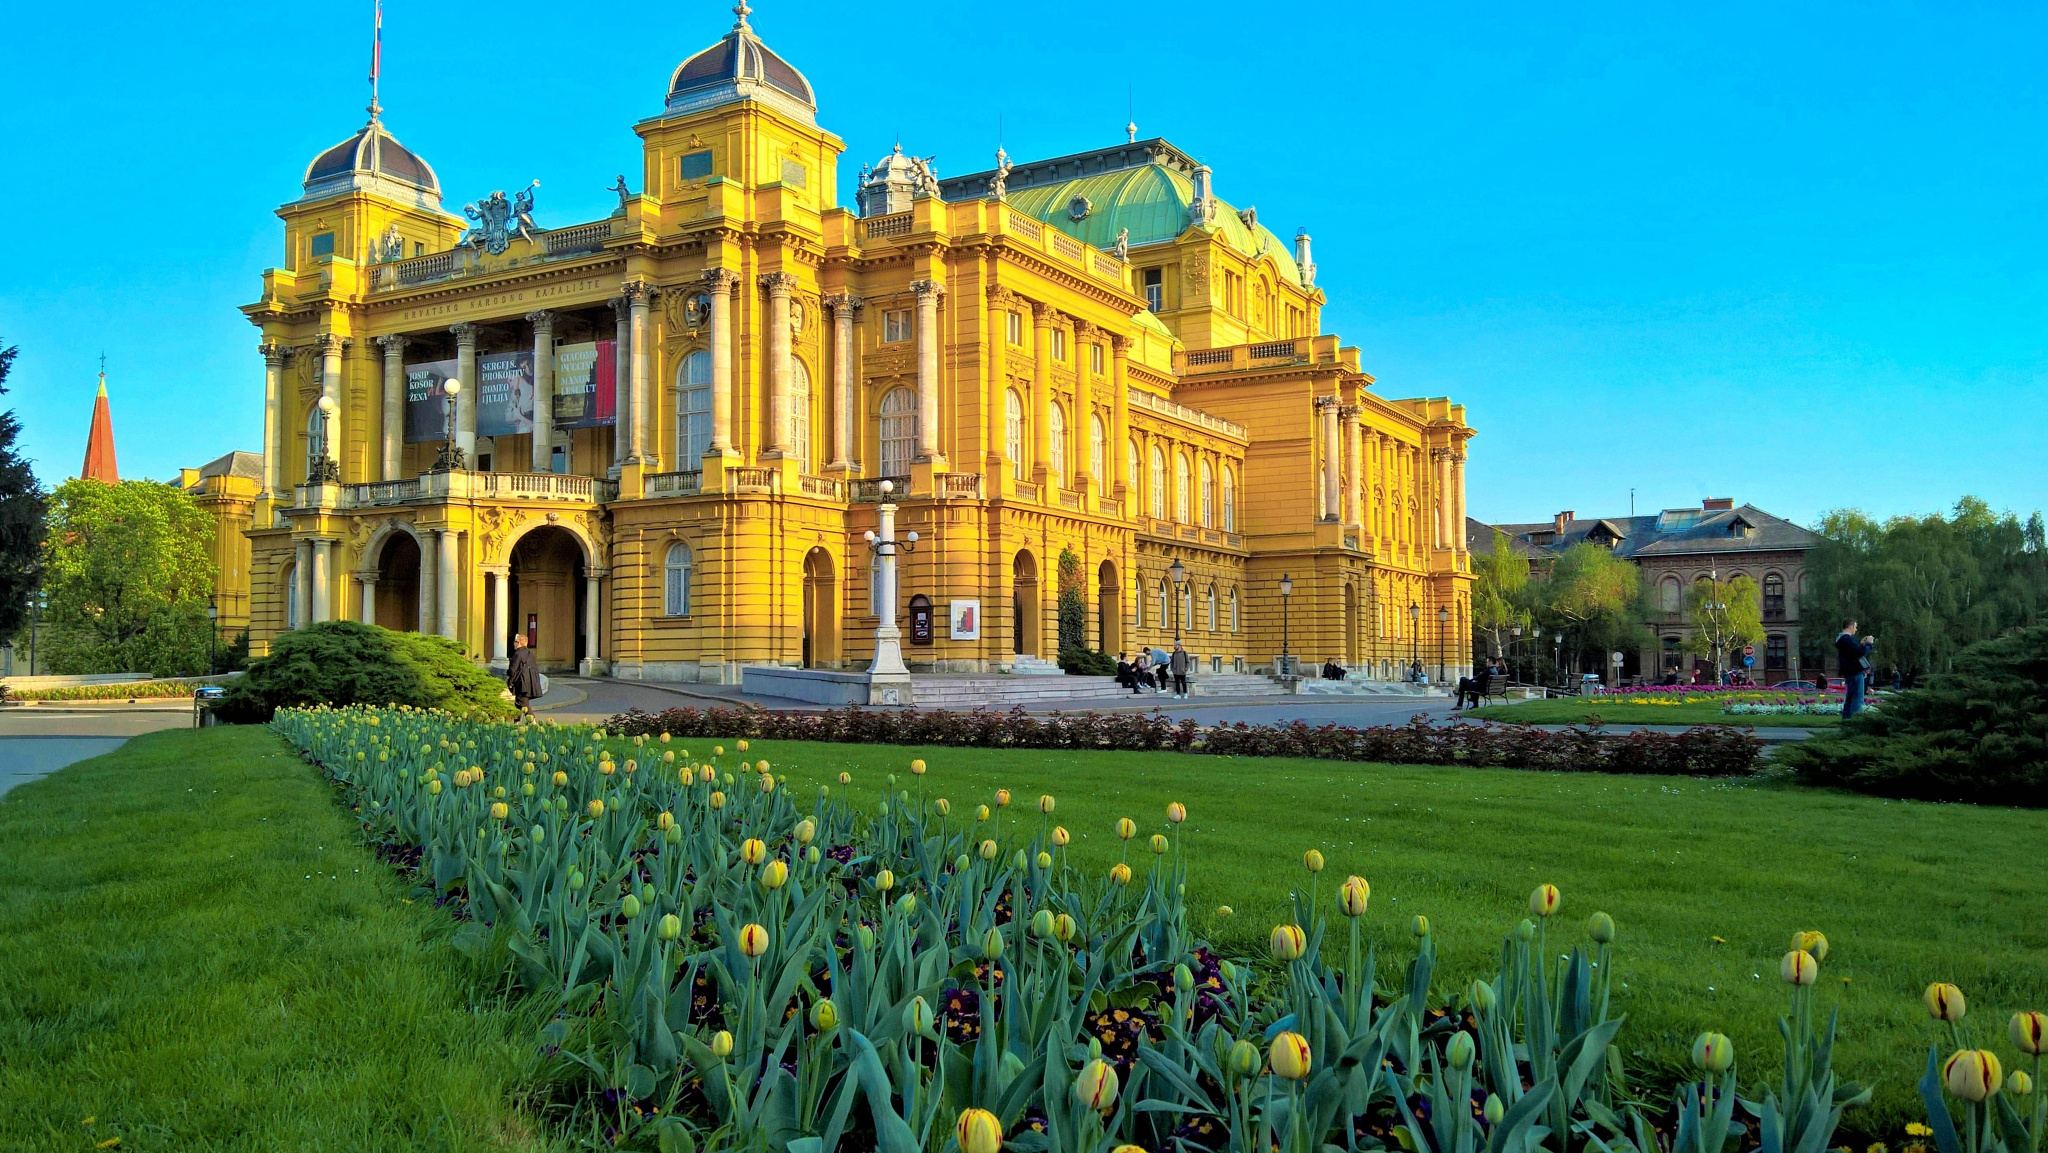 Croatian National Theatre in Zagreb by David Guo